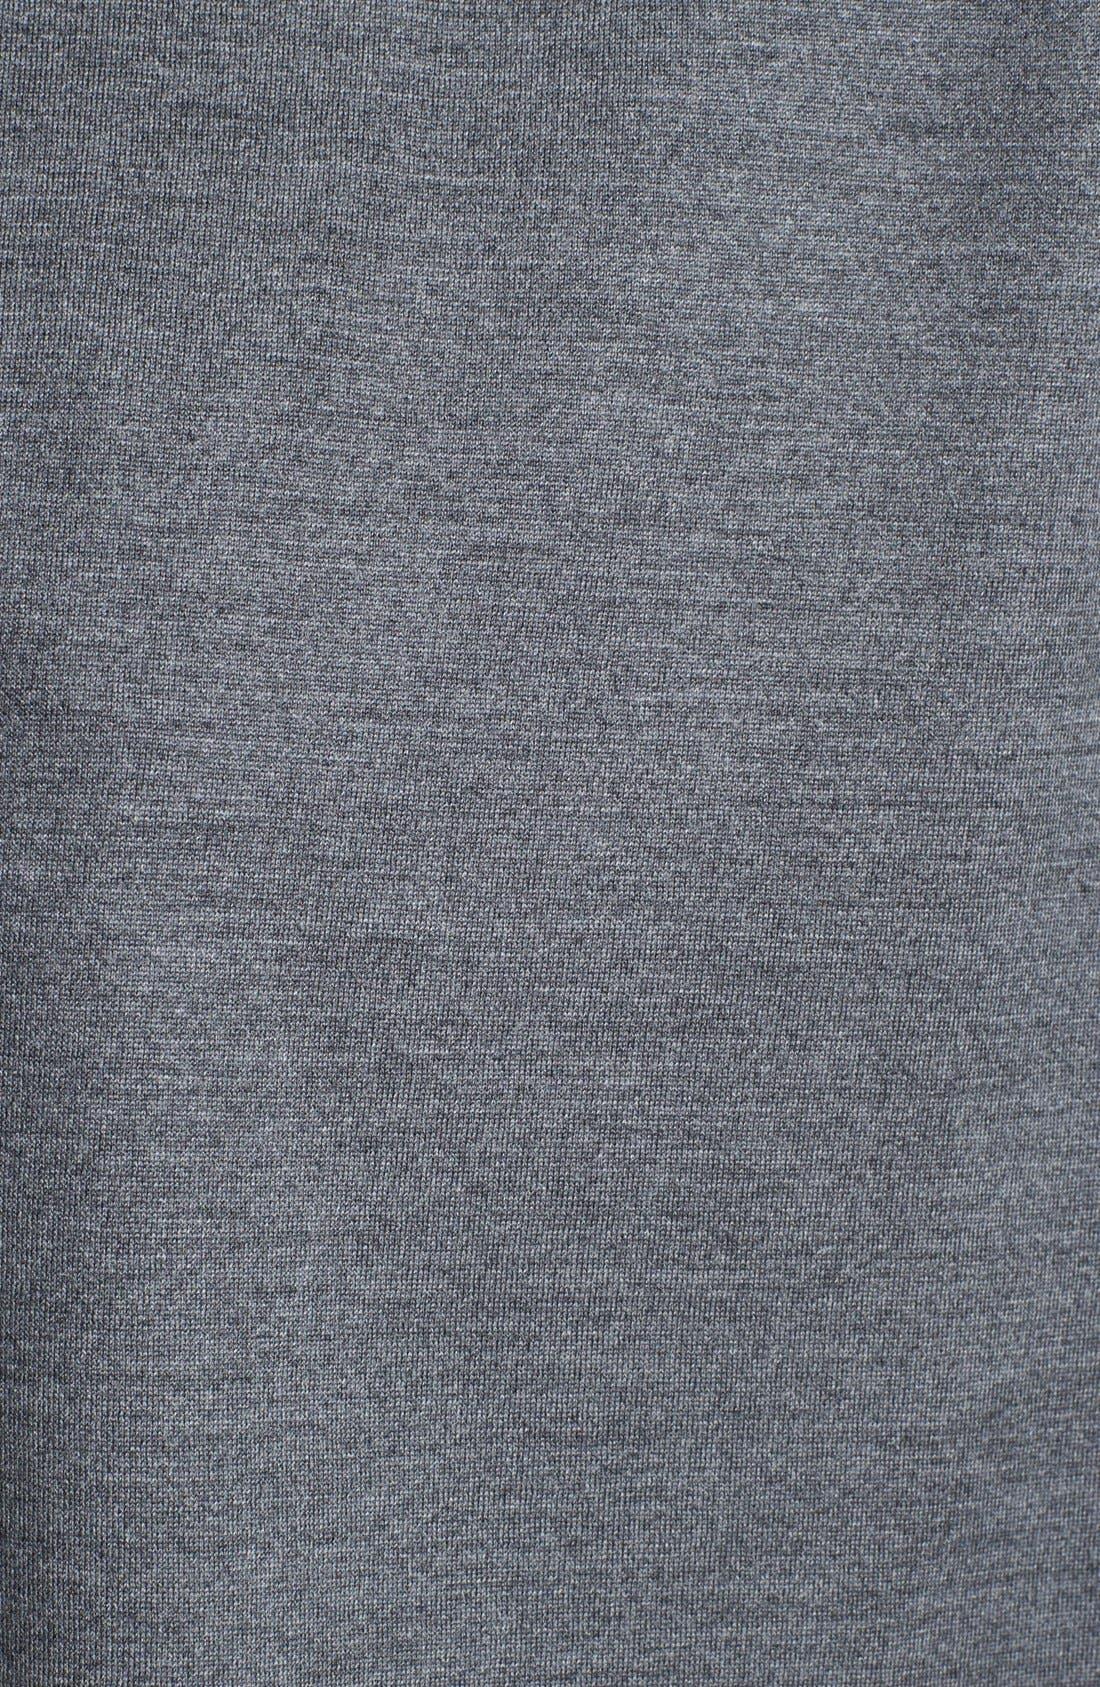 Alternate Image 3  - Thom Browne Merino Wool Pocket T-Shirt